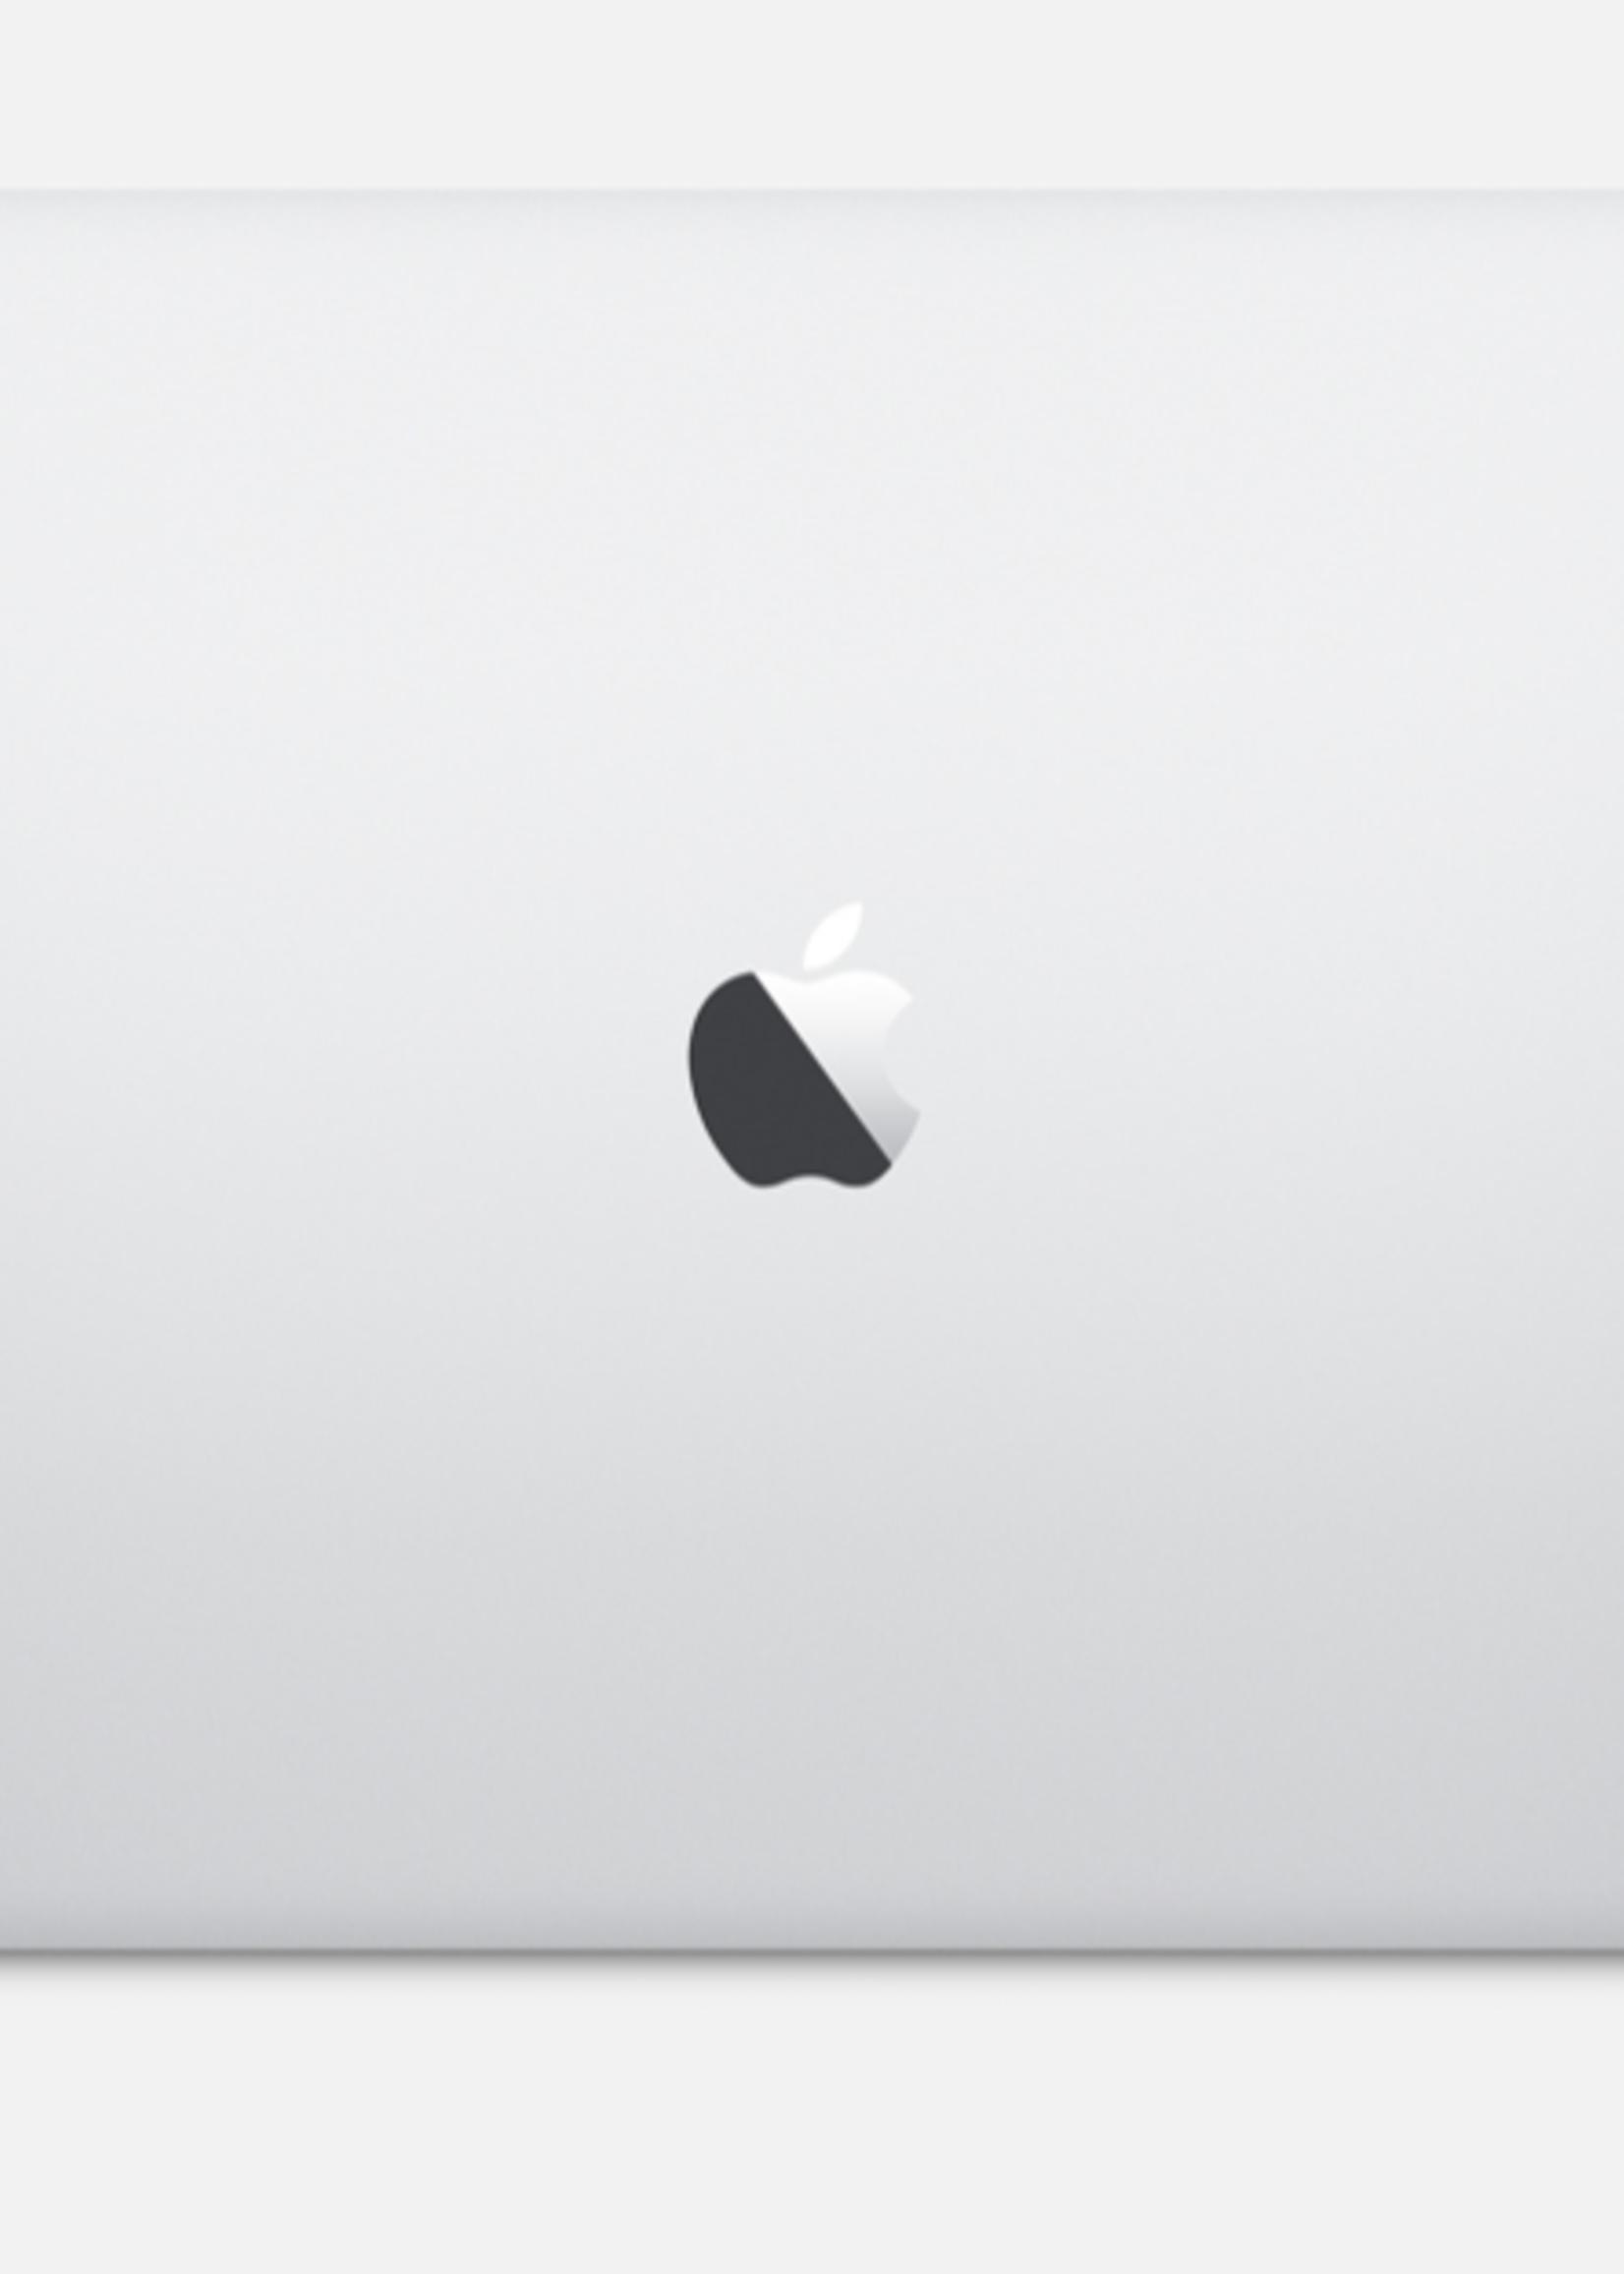 "15"" Macbook Pro w/ touch - 256GB - silver"